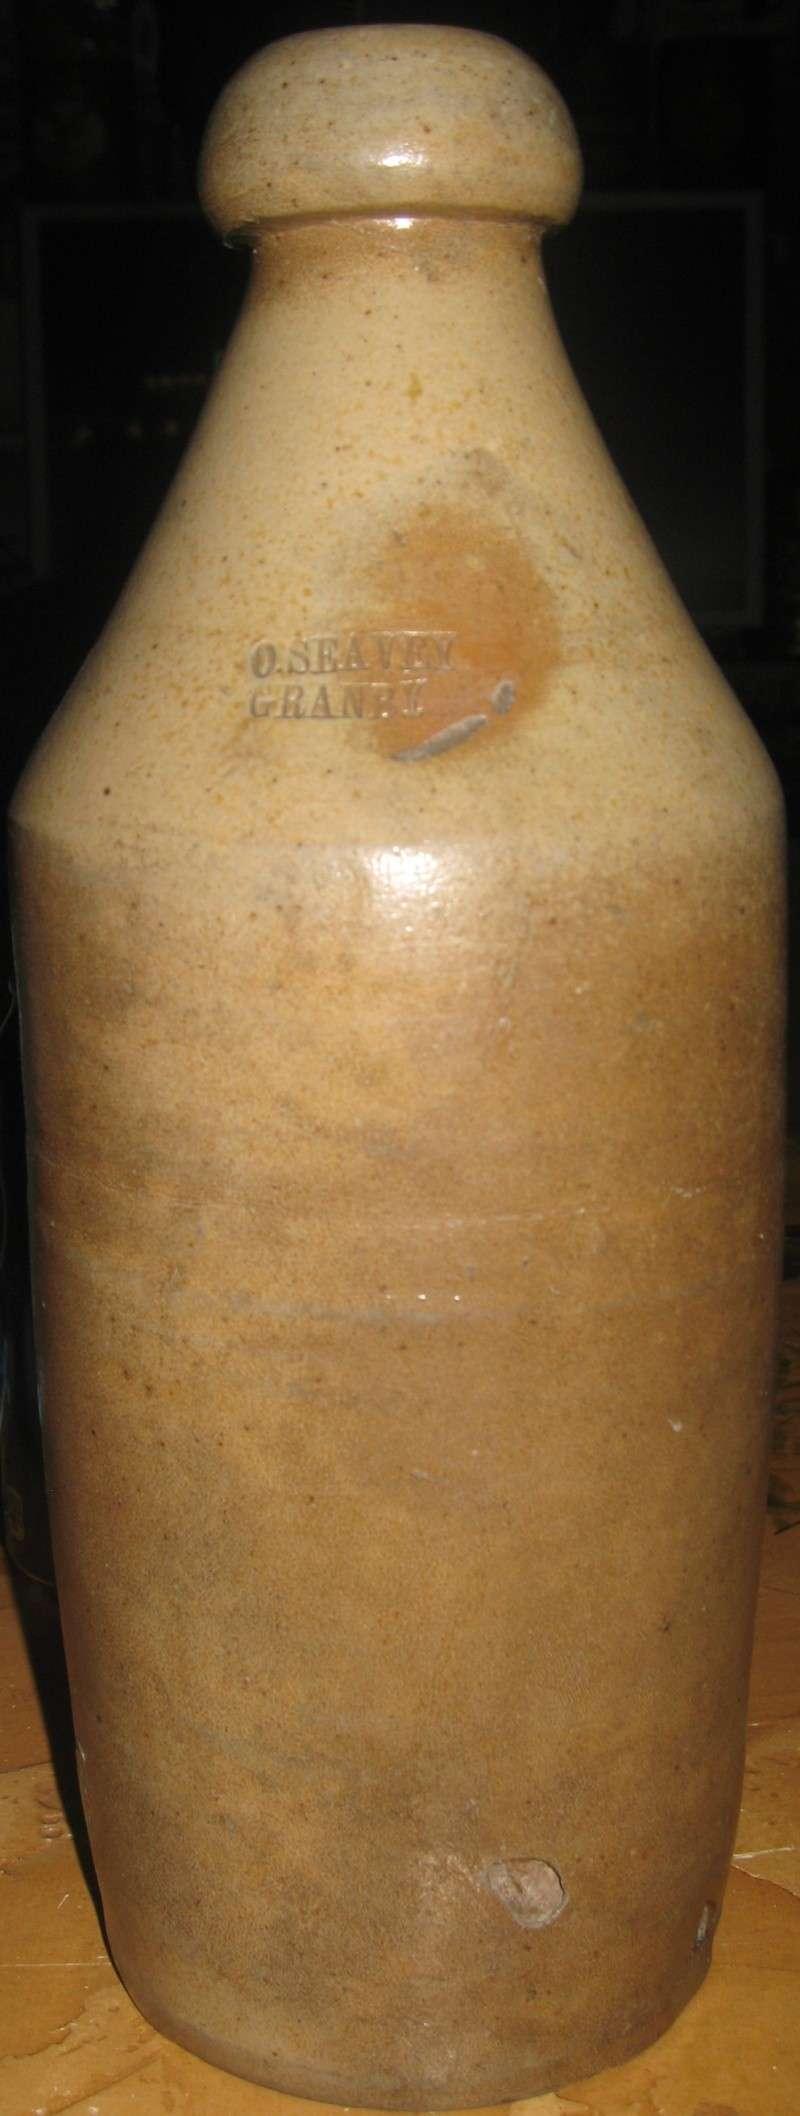 a voir une ginger beer  primitive de granby  Img_6611